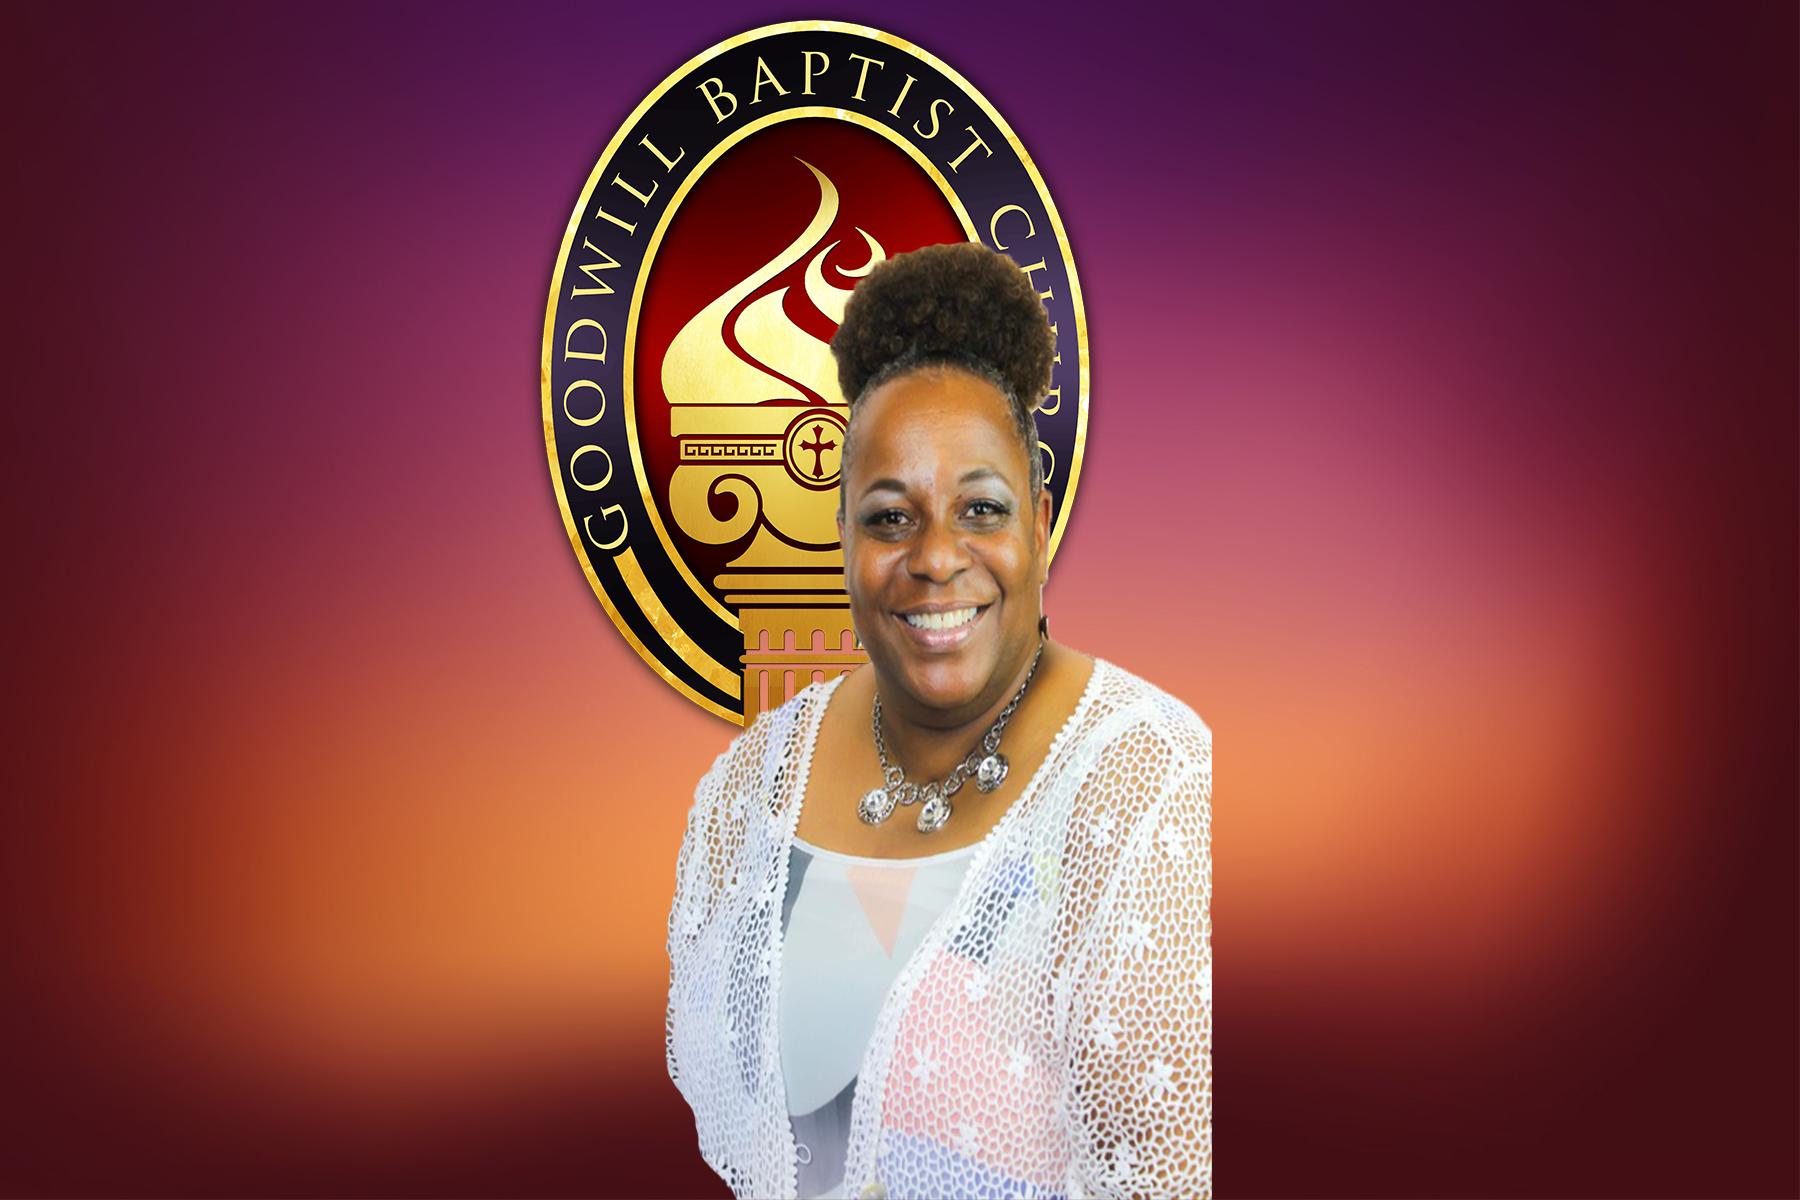 Sis. Daphne McFadden - Hospitality Ministry